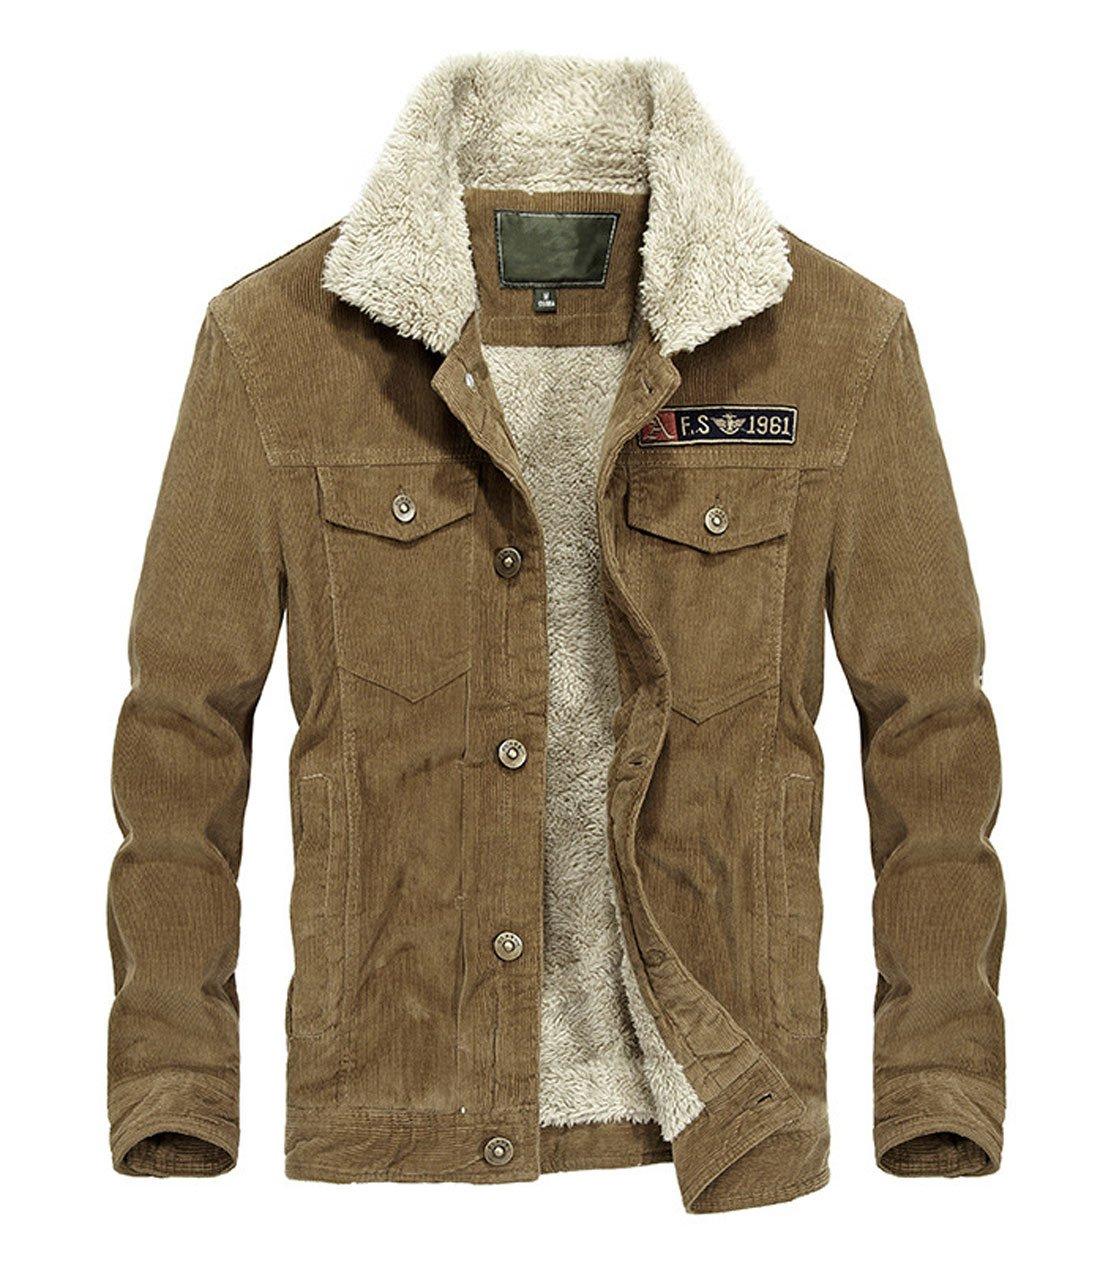 Chartou Men's Vintage Button-Front Sherpa Lined Shearling Slim Fit Corduroy Denim Jacket (Medium, Khaki-Fleece)